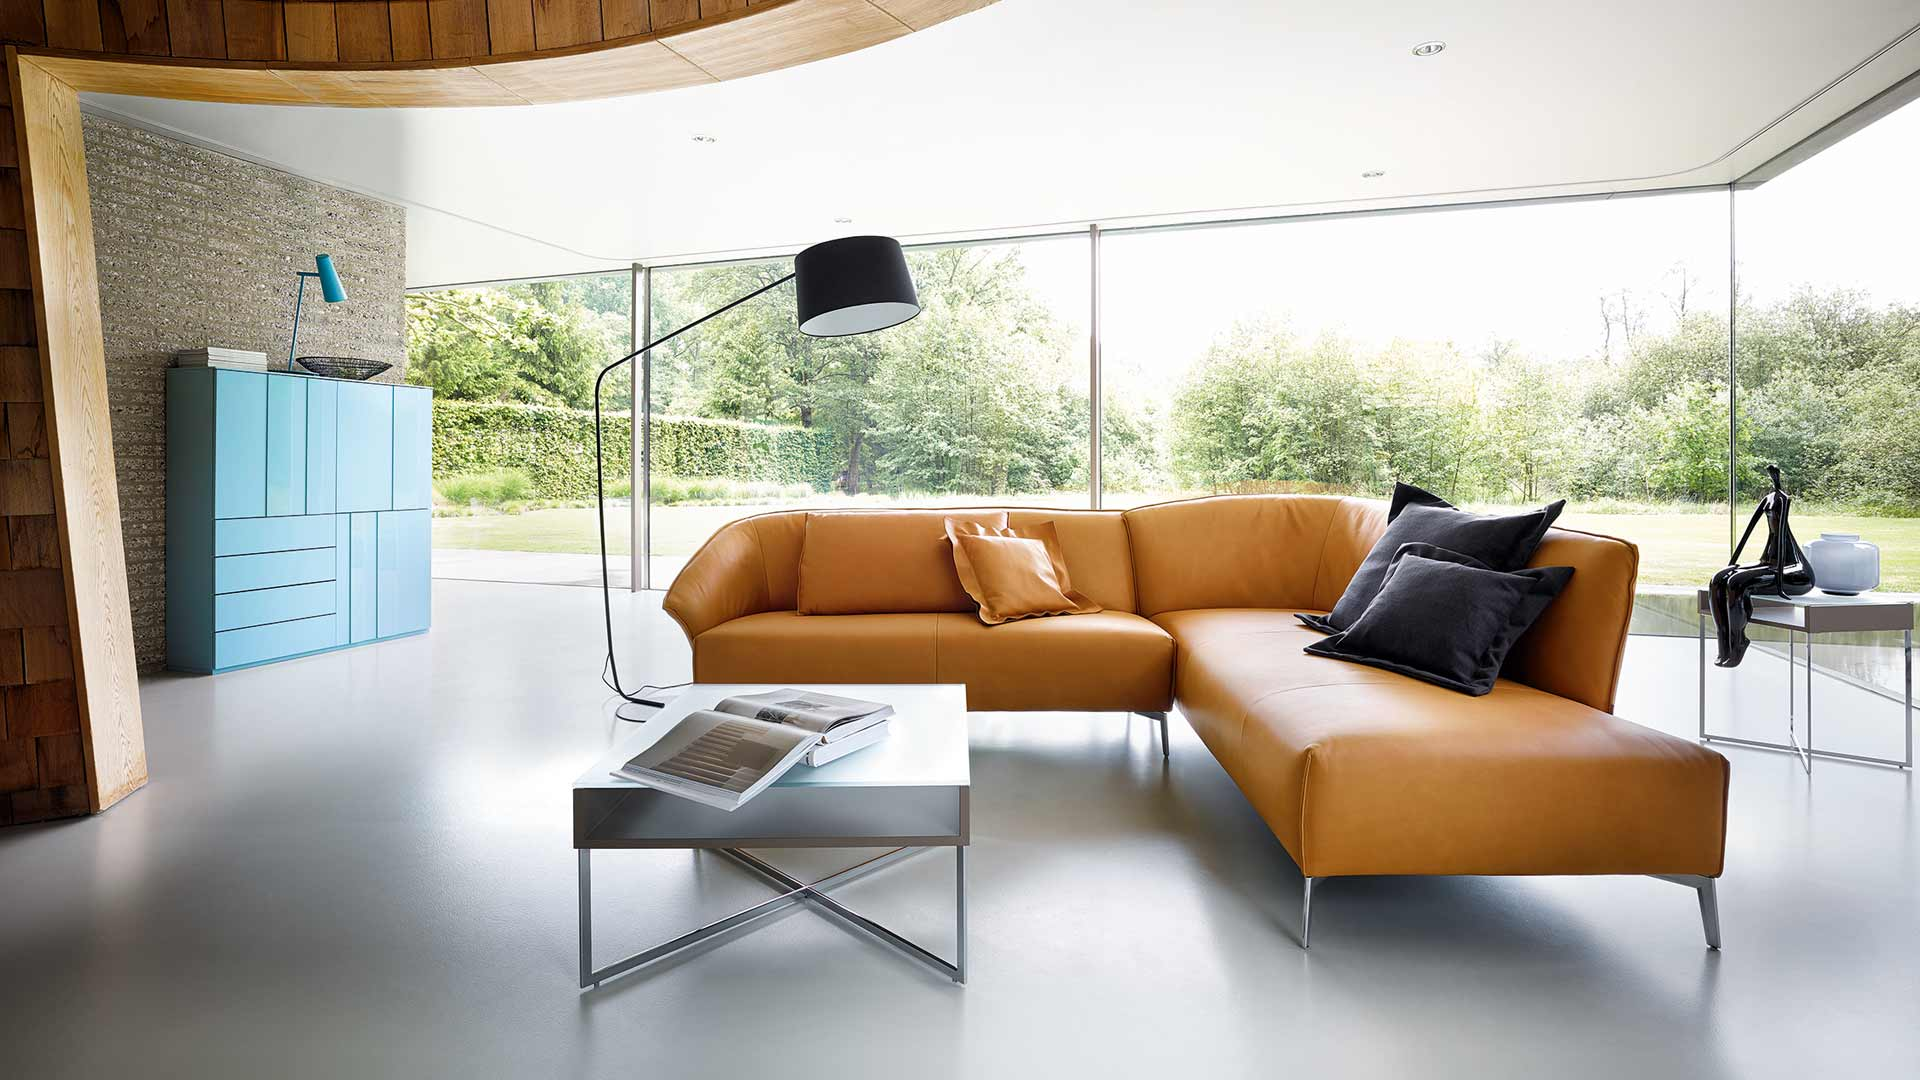 mbel passau excellent in passau with mbel passau trendy moebel direkt online mit passau jetzt. Black Bedroom Furniture Sets. Home Design Ideas